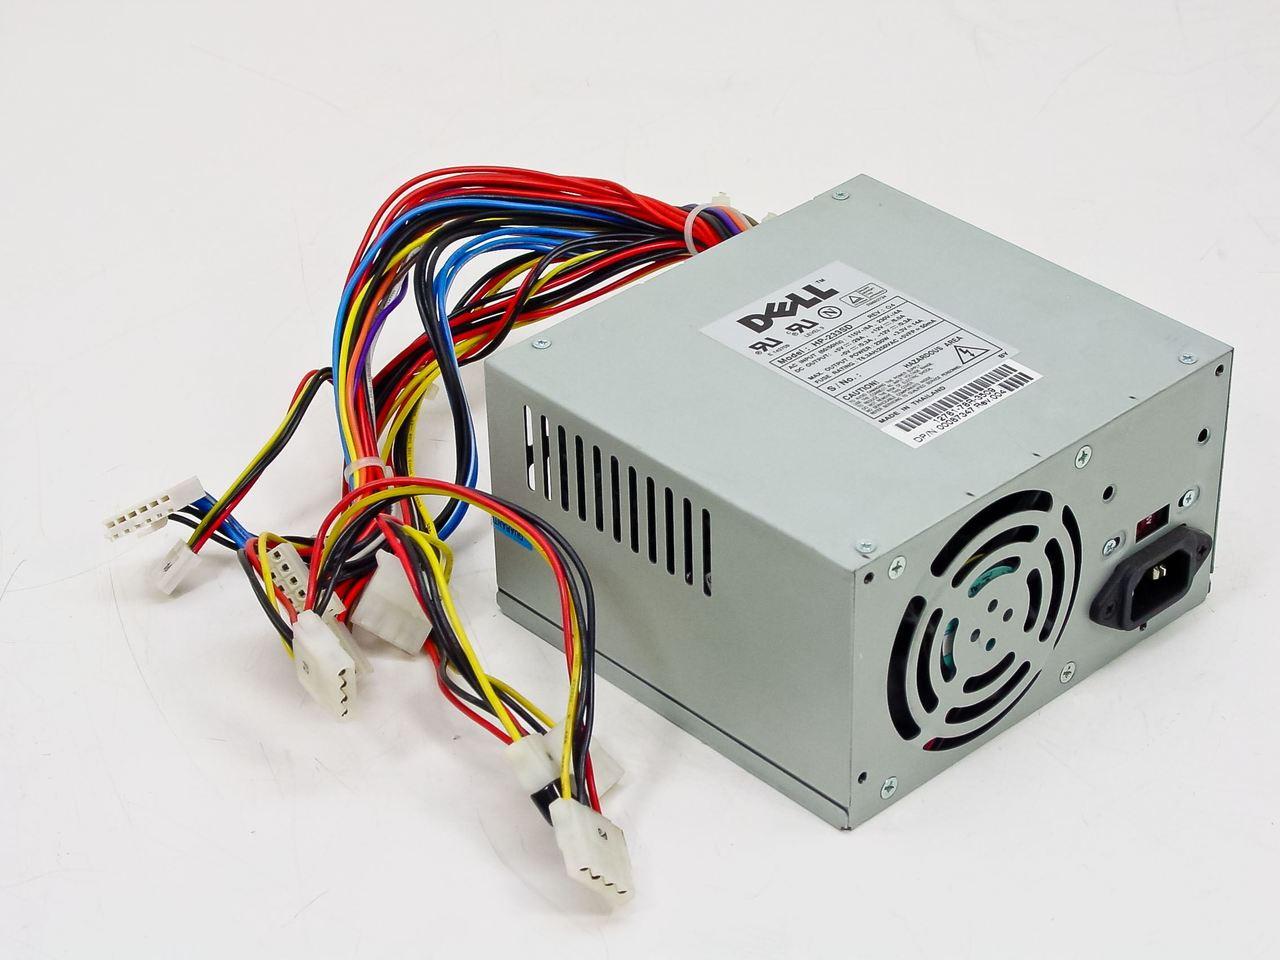 power supply model h275p 01 wiring diagram supply  u2022 readyjetset co dell optiplex 780 small form factor manual dell optiplex 780 sff drivers